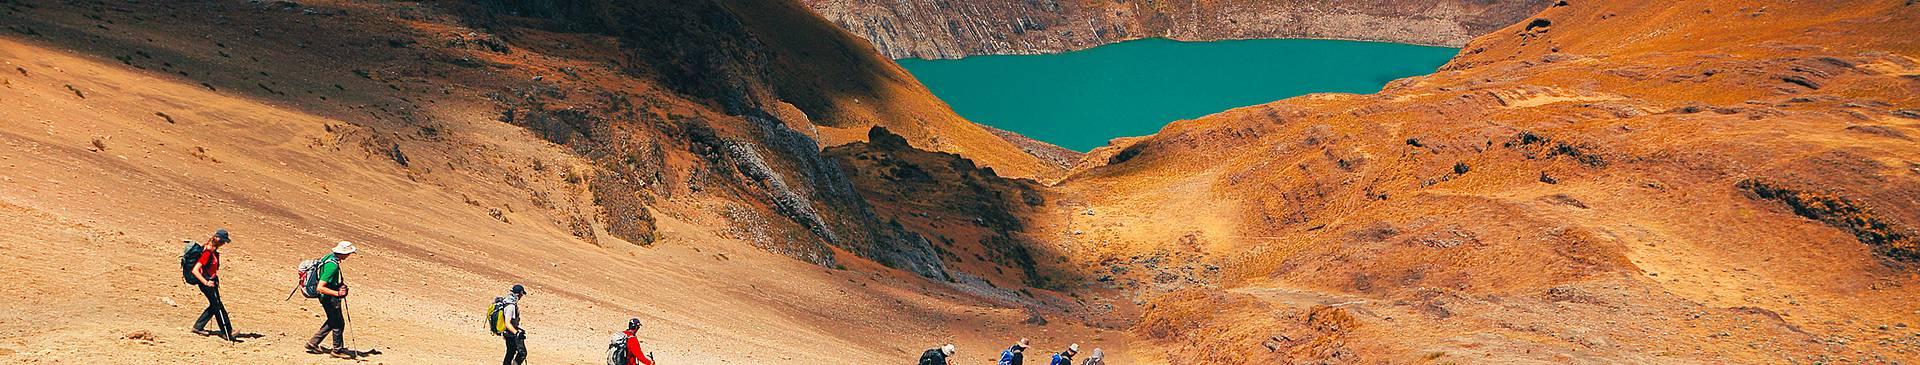 Viaggi di gruppo in Perù